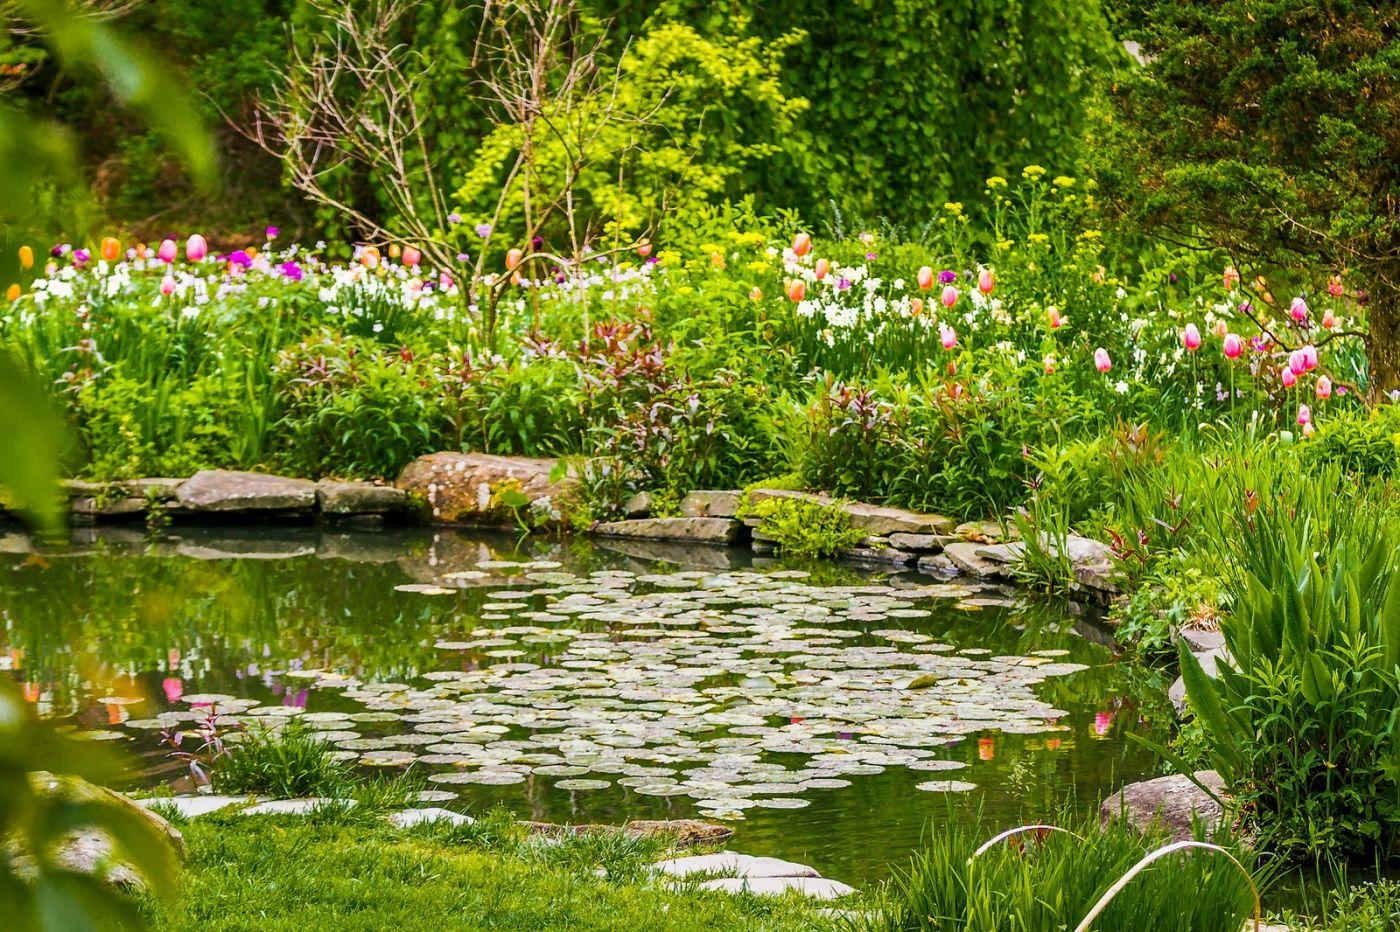 Chanticleer花园,融入自然_图1-23